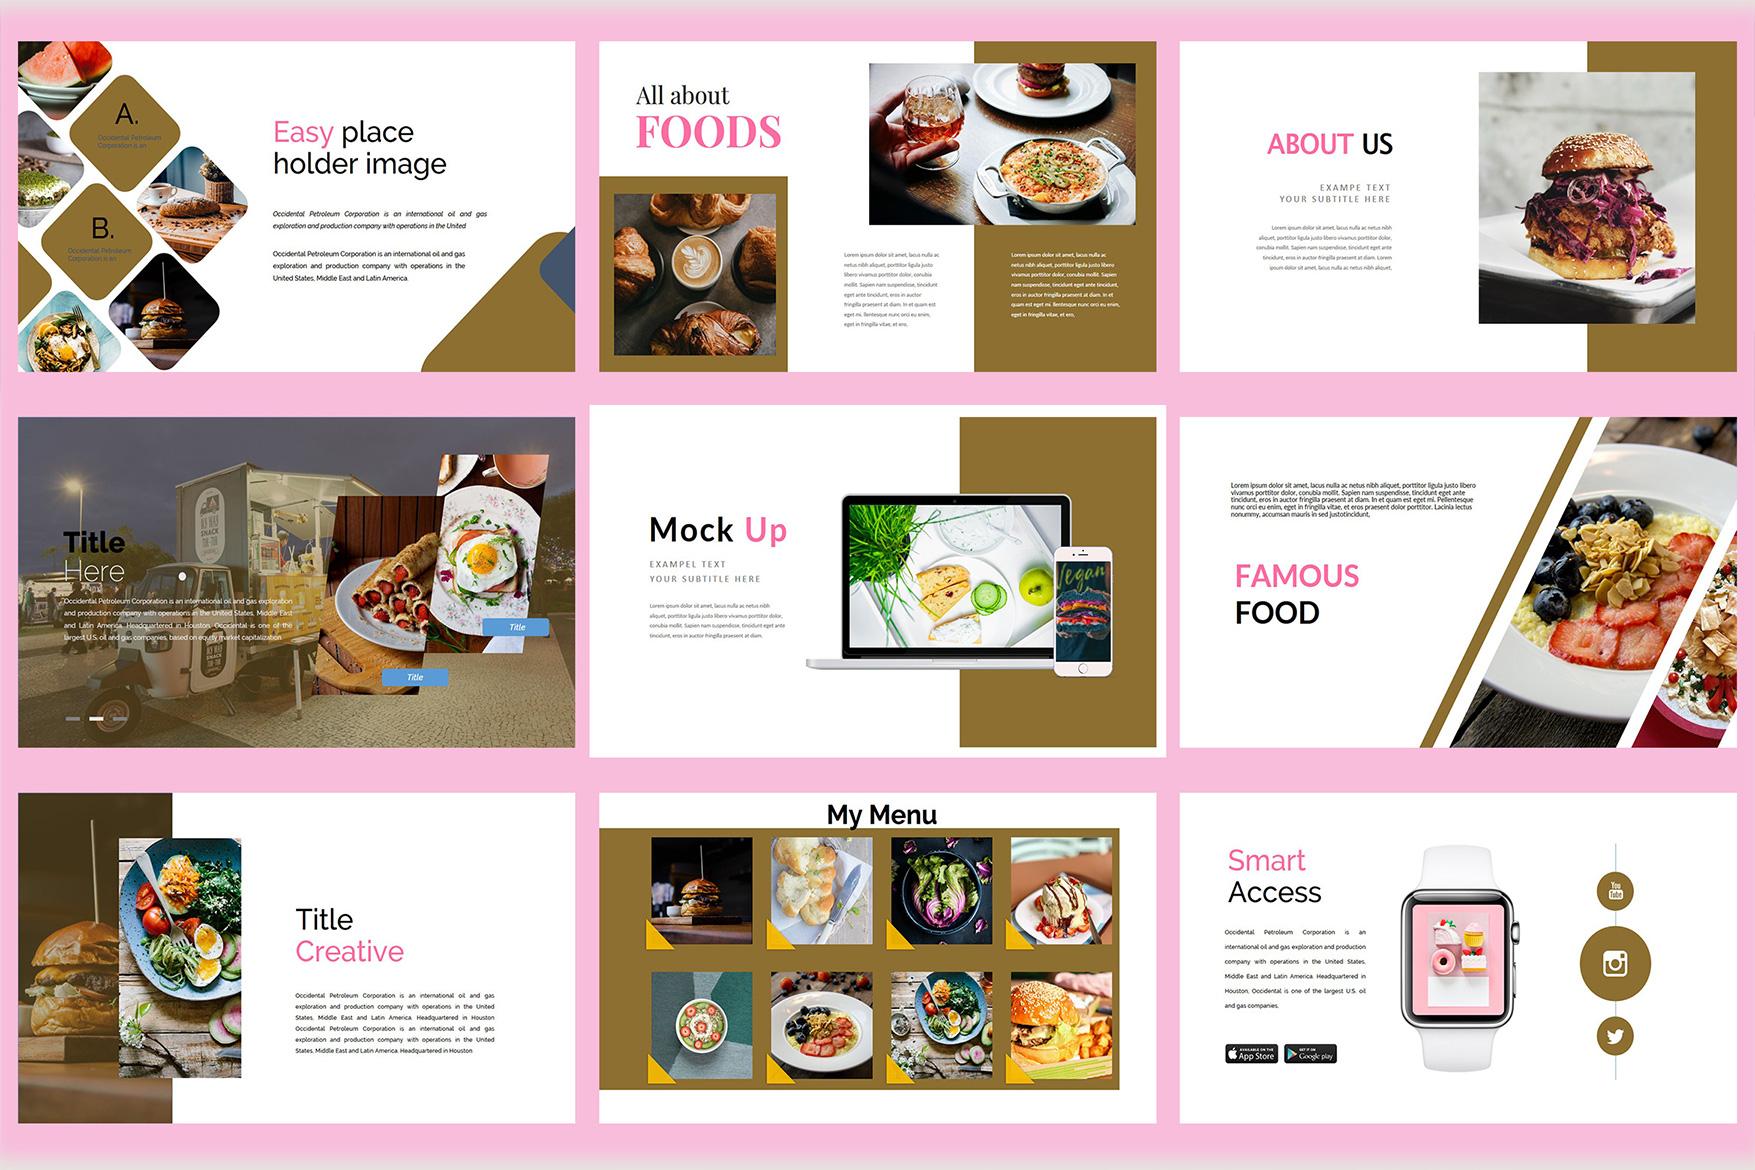 Delicious Food - Google Slides Presentation example image 8